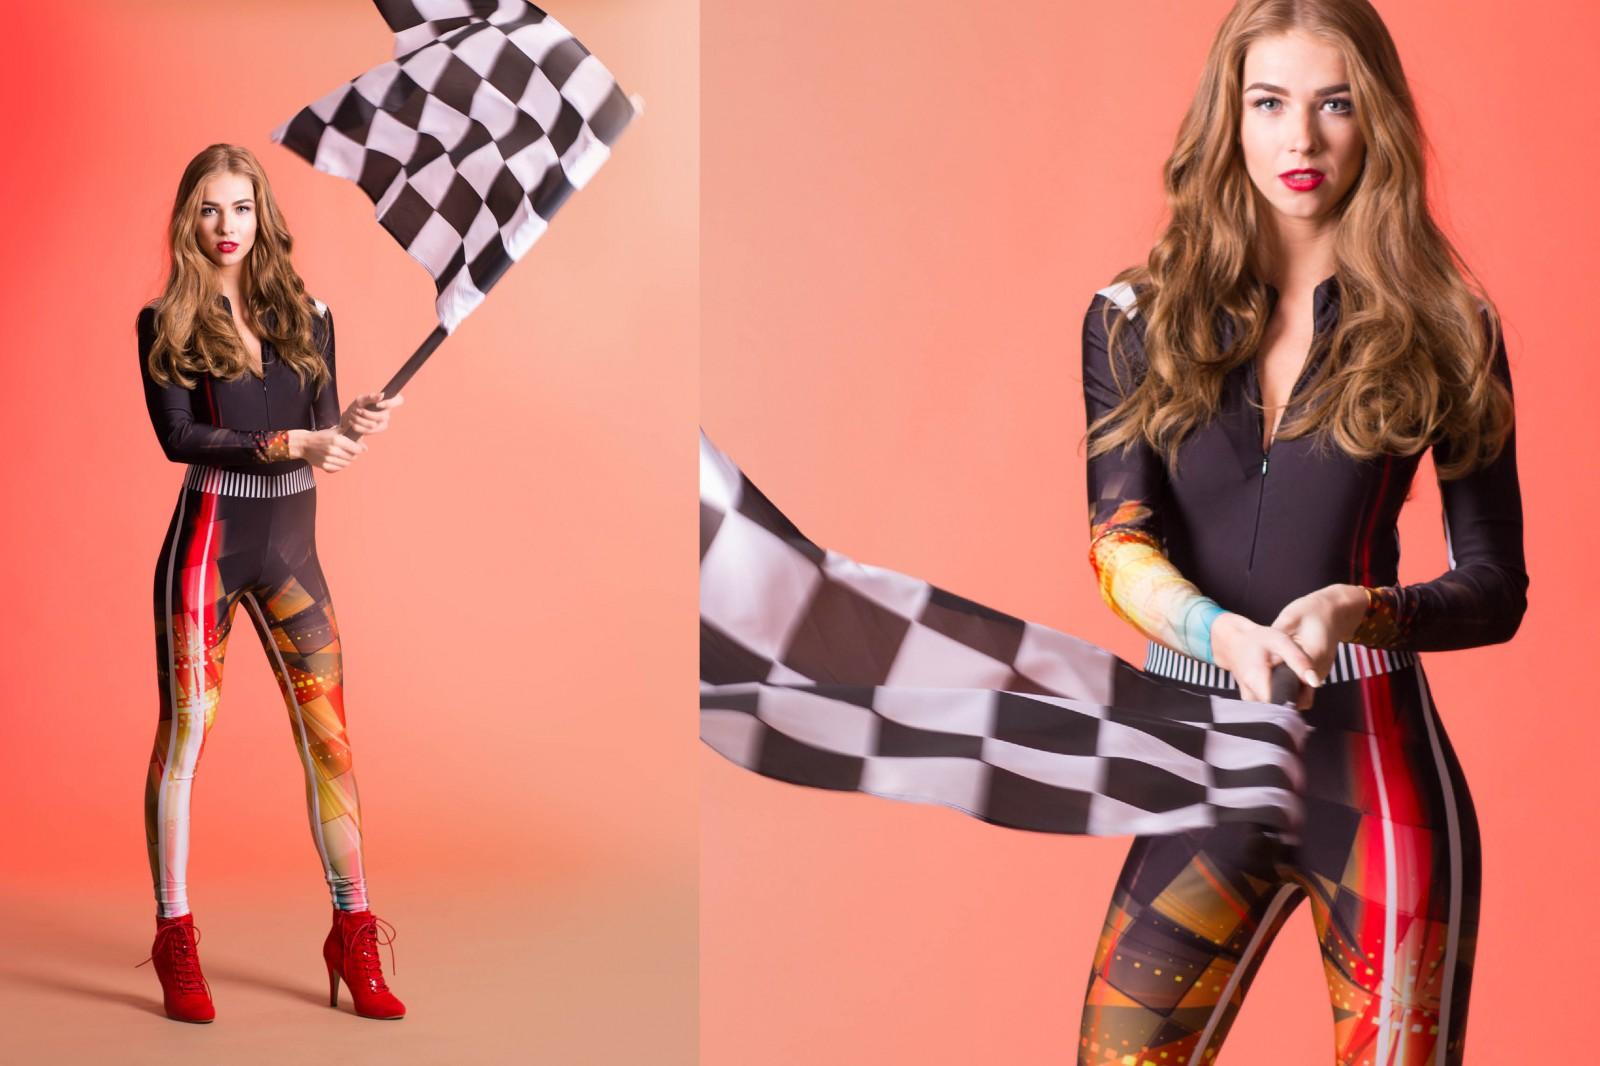 speed, vlaggendame, racing, pitspoes, snelheid, racetrack, raceauto, gridgril, entertainment